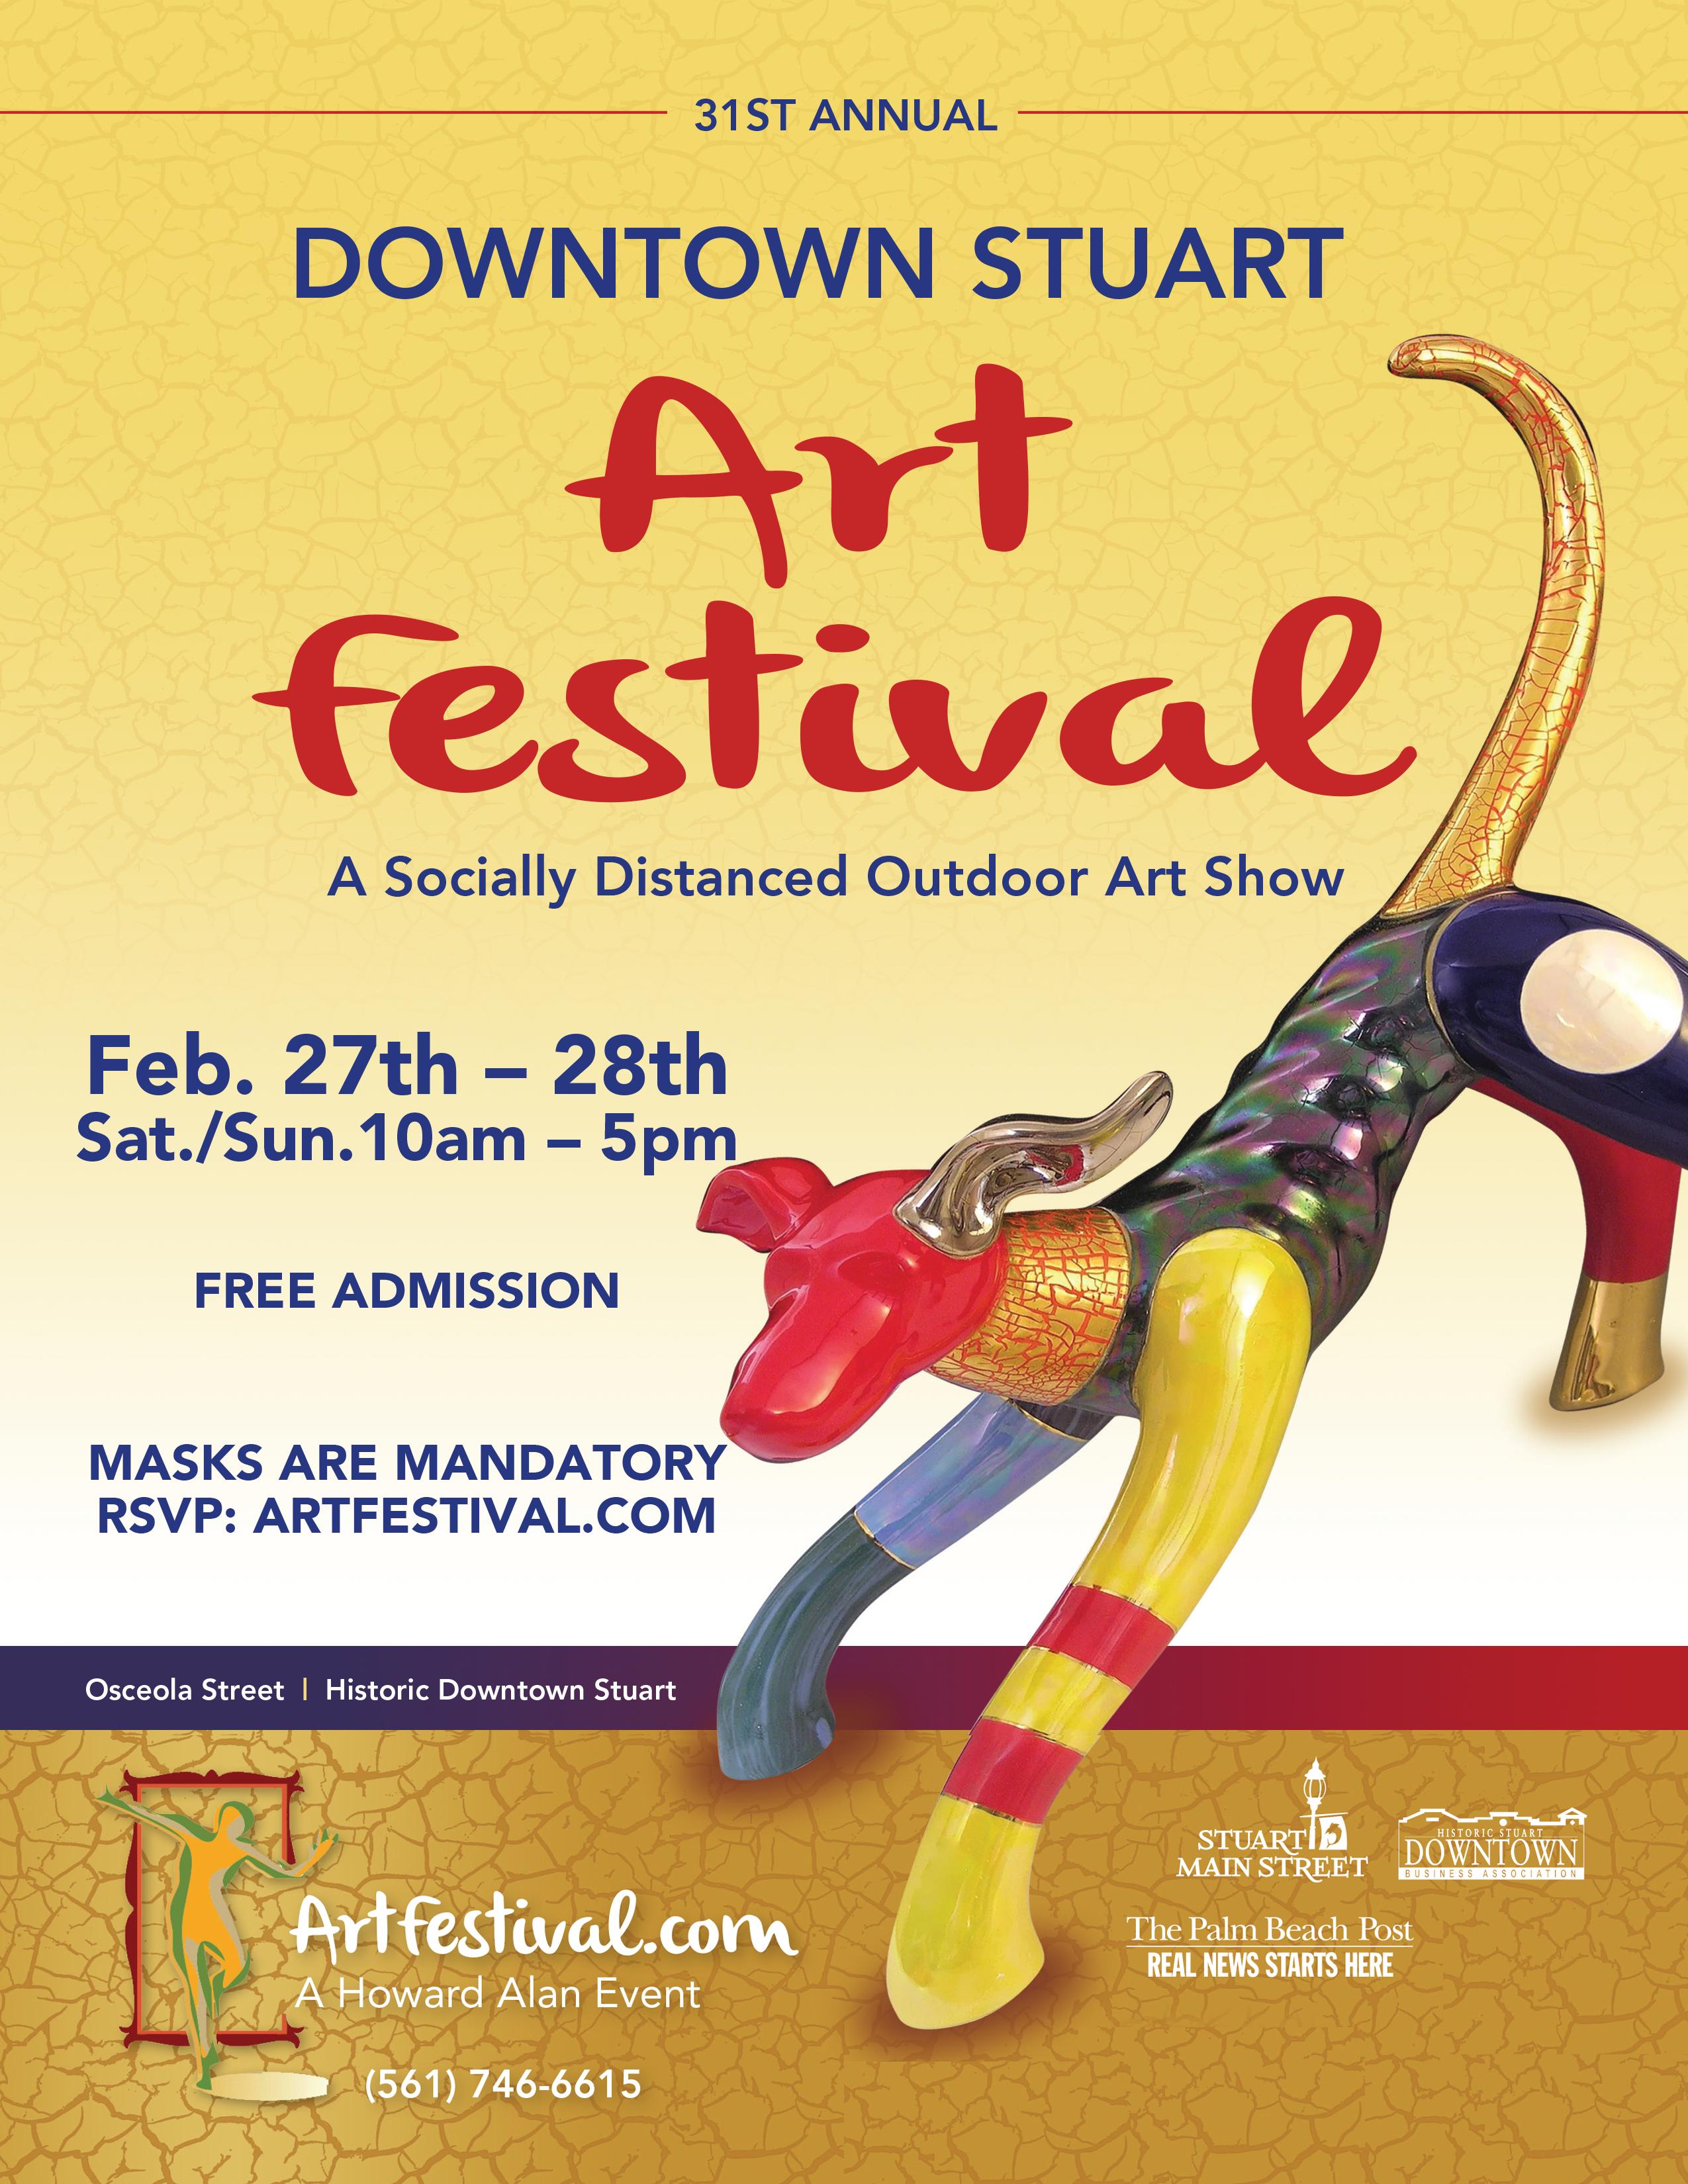 31st Annual Downtown Stuart Art Festival